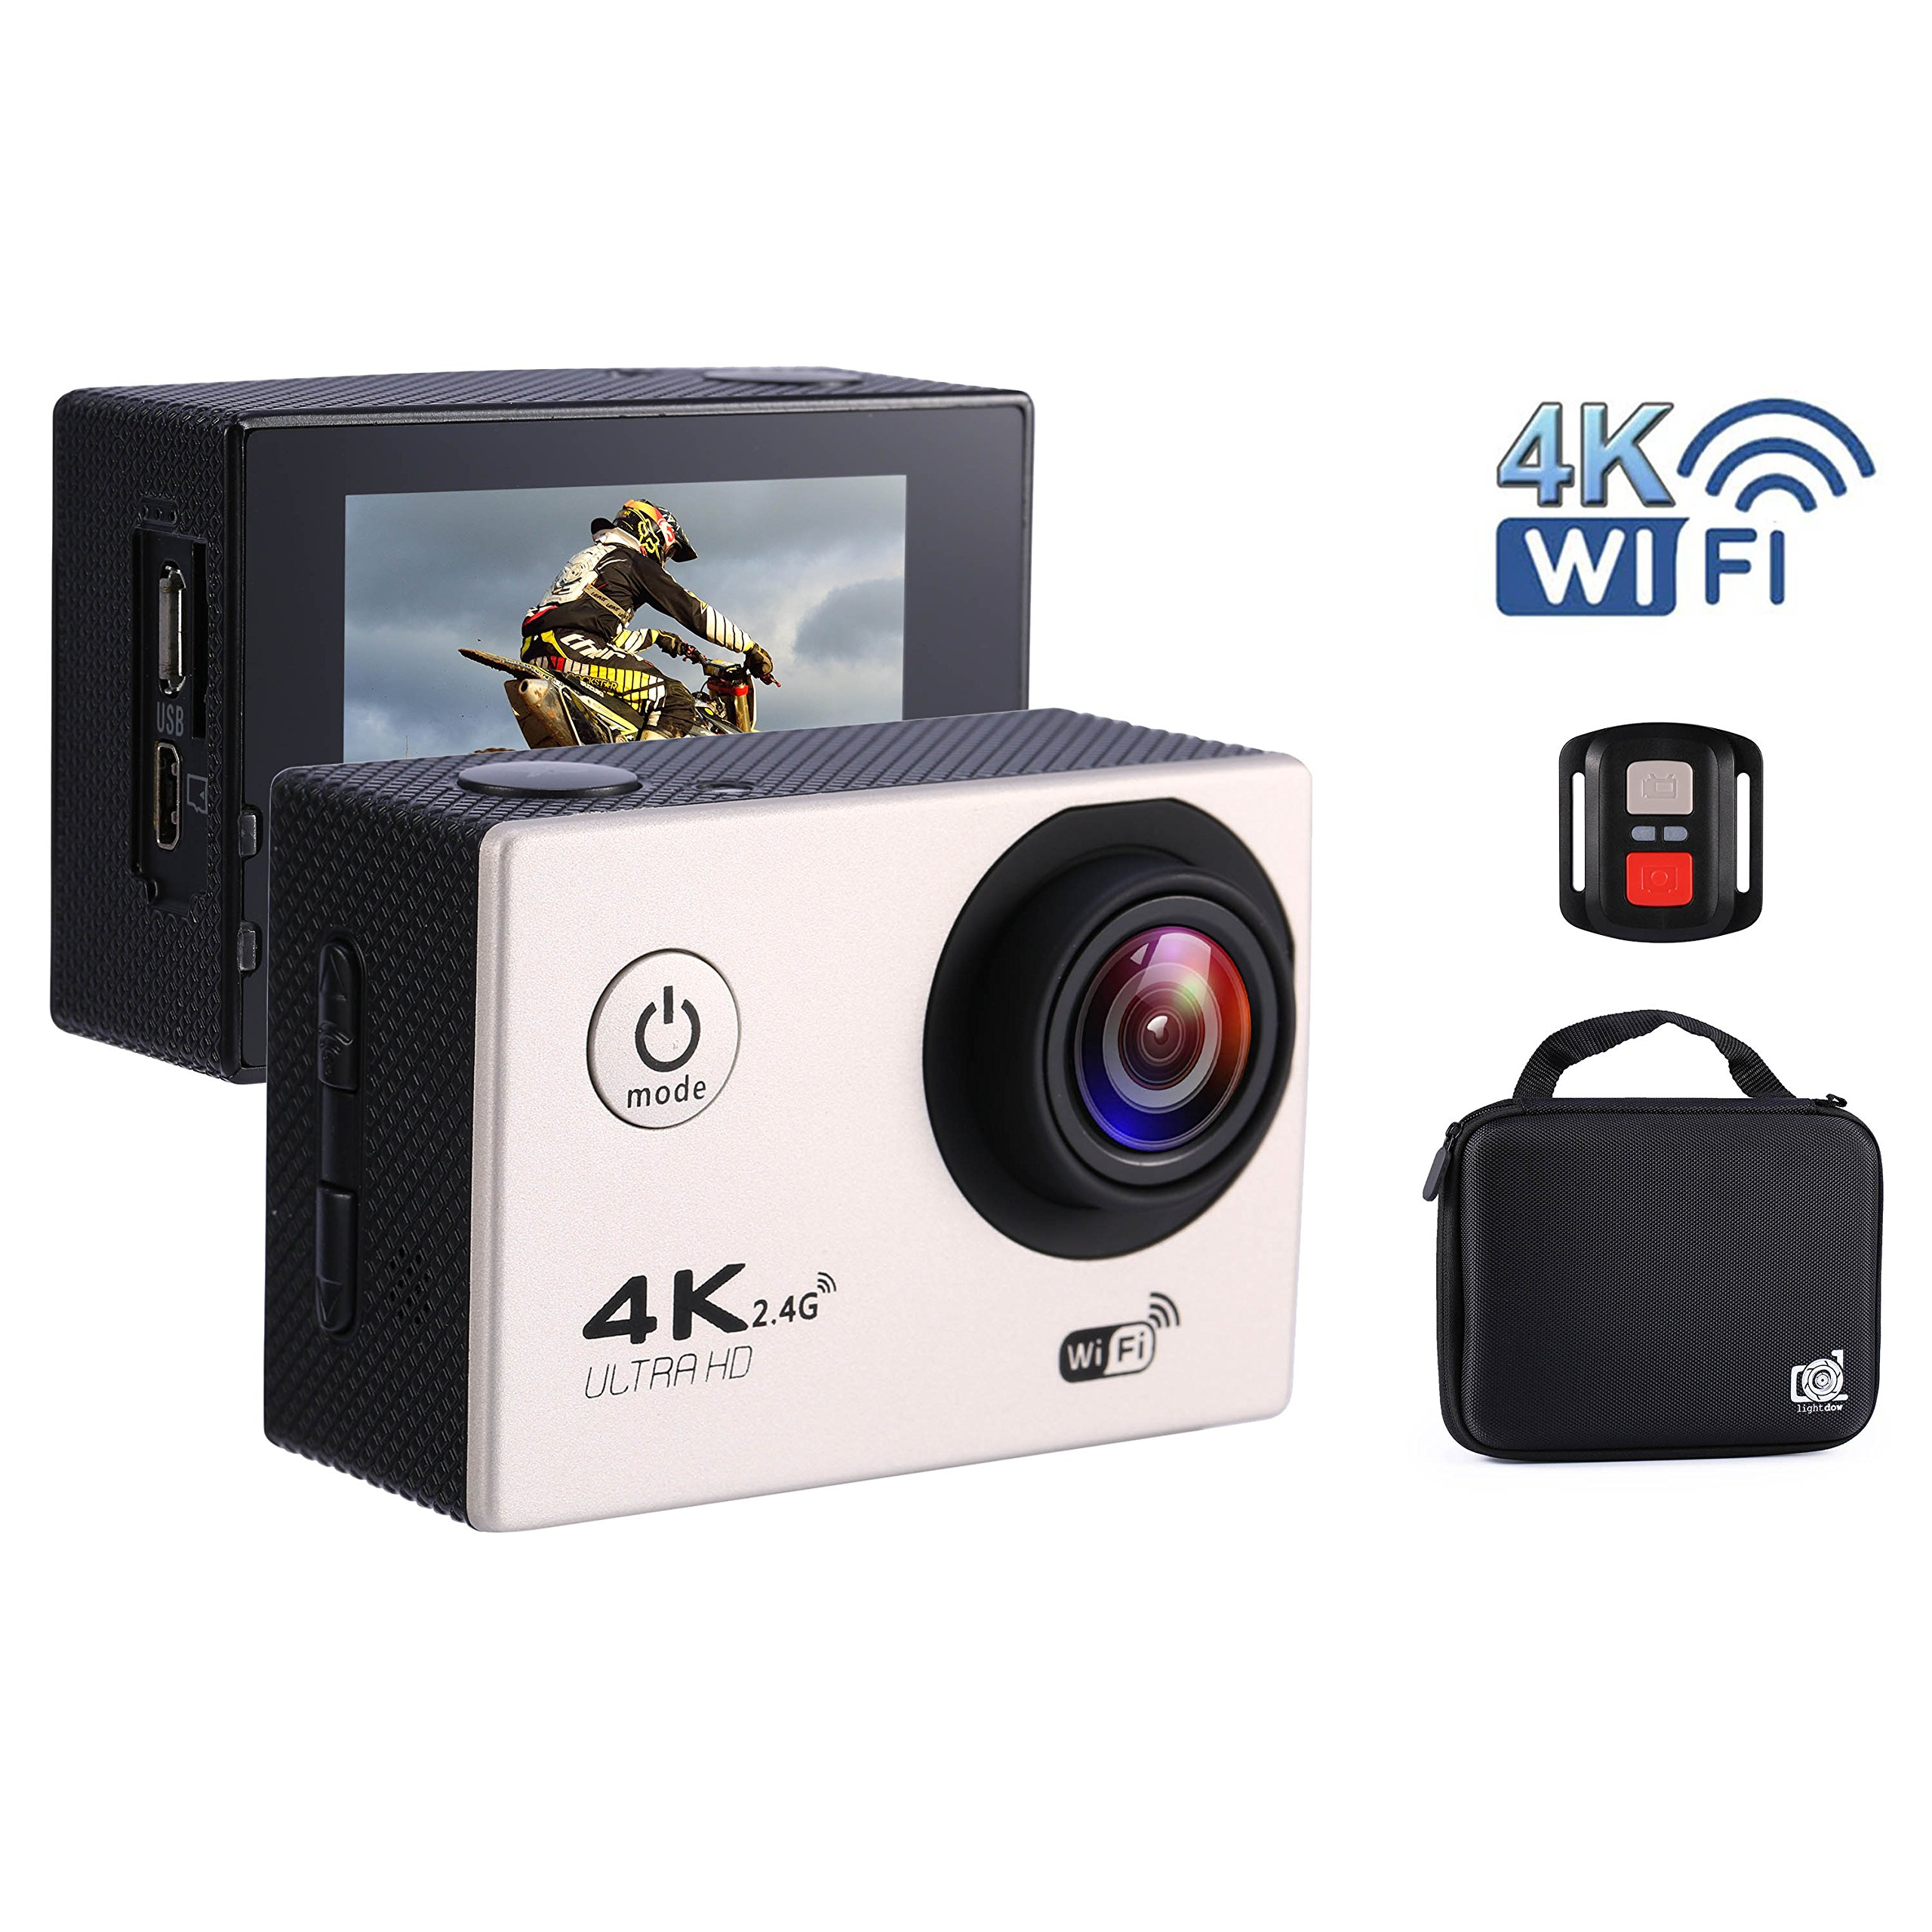 Sport Action WIFI Caméra 4K 1080P Ultra HD Sous-Marine 30m Imperméable, Caméra Angle 70 ° -170 °, Ecran LCD 2.0 \